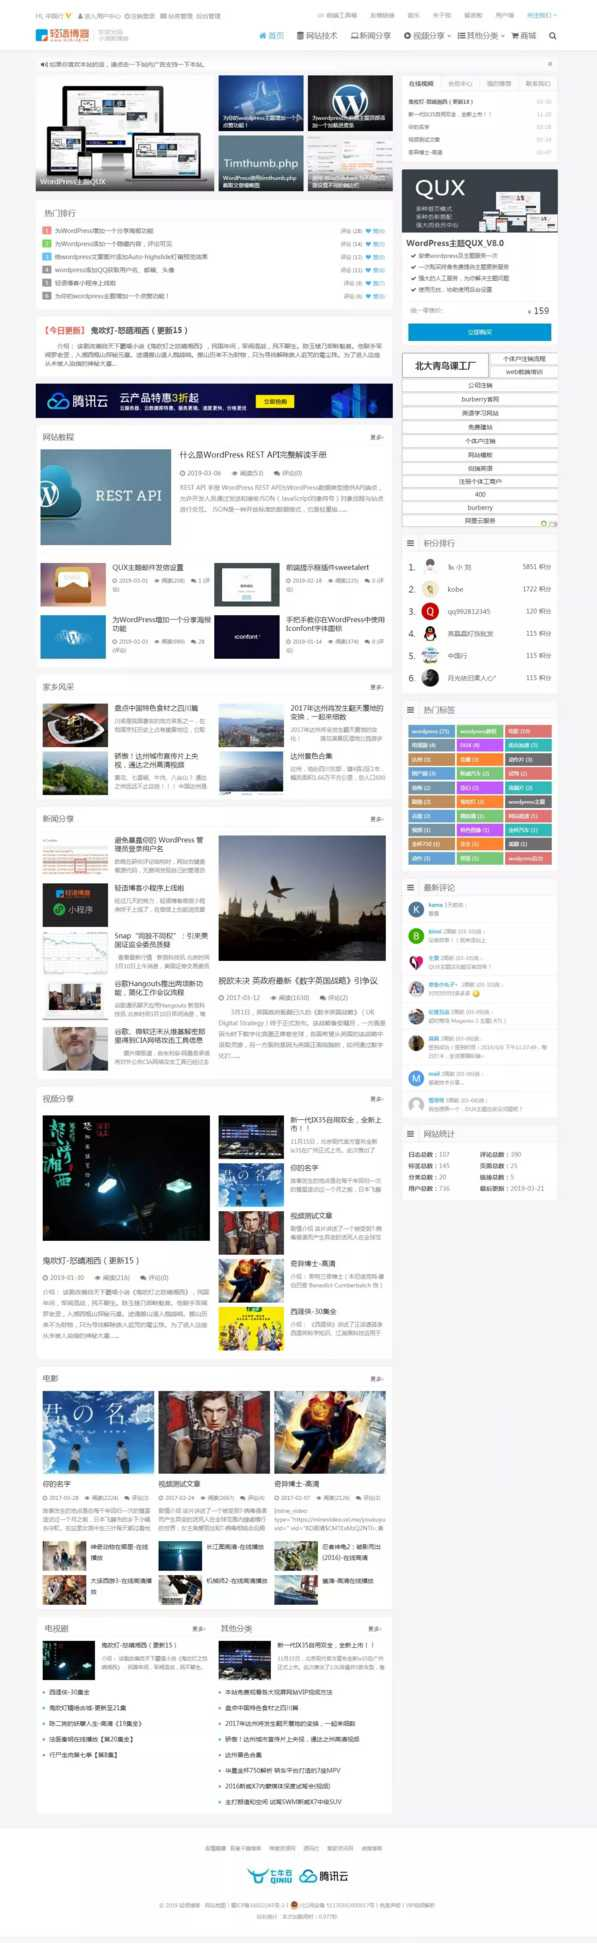 WordPress主题QUX DUX加强版[更新至9.1]插图